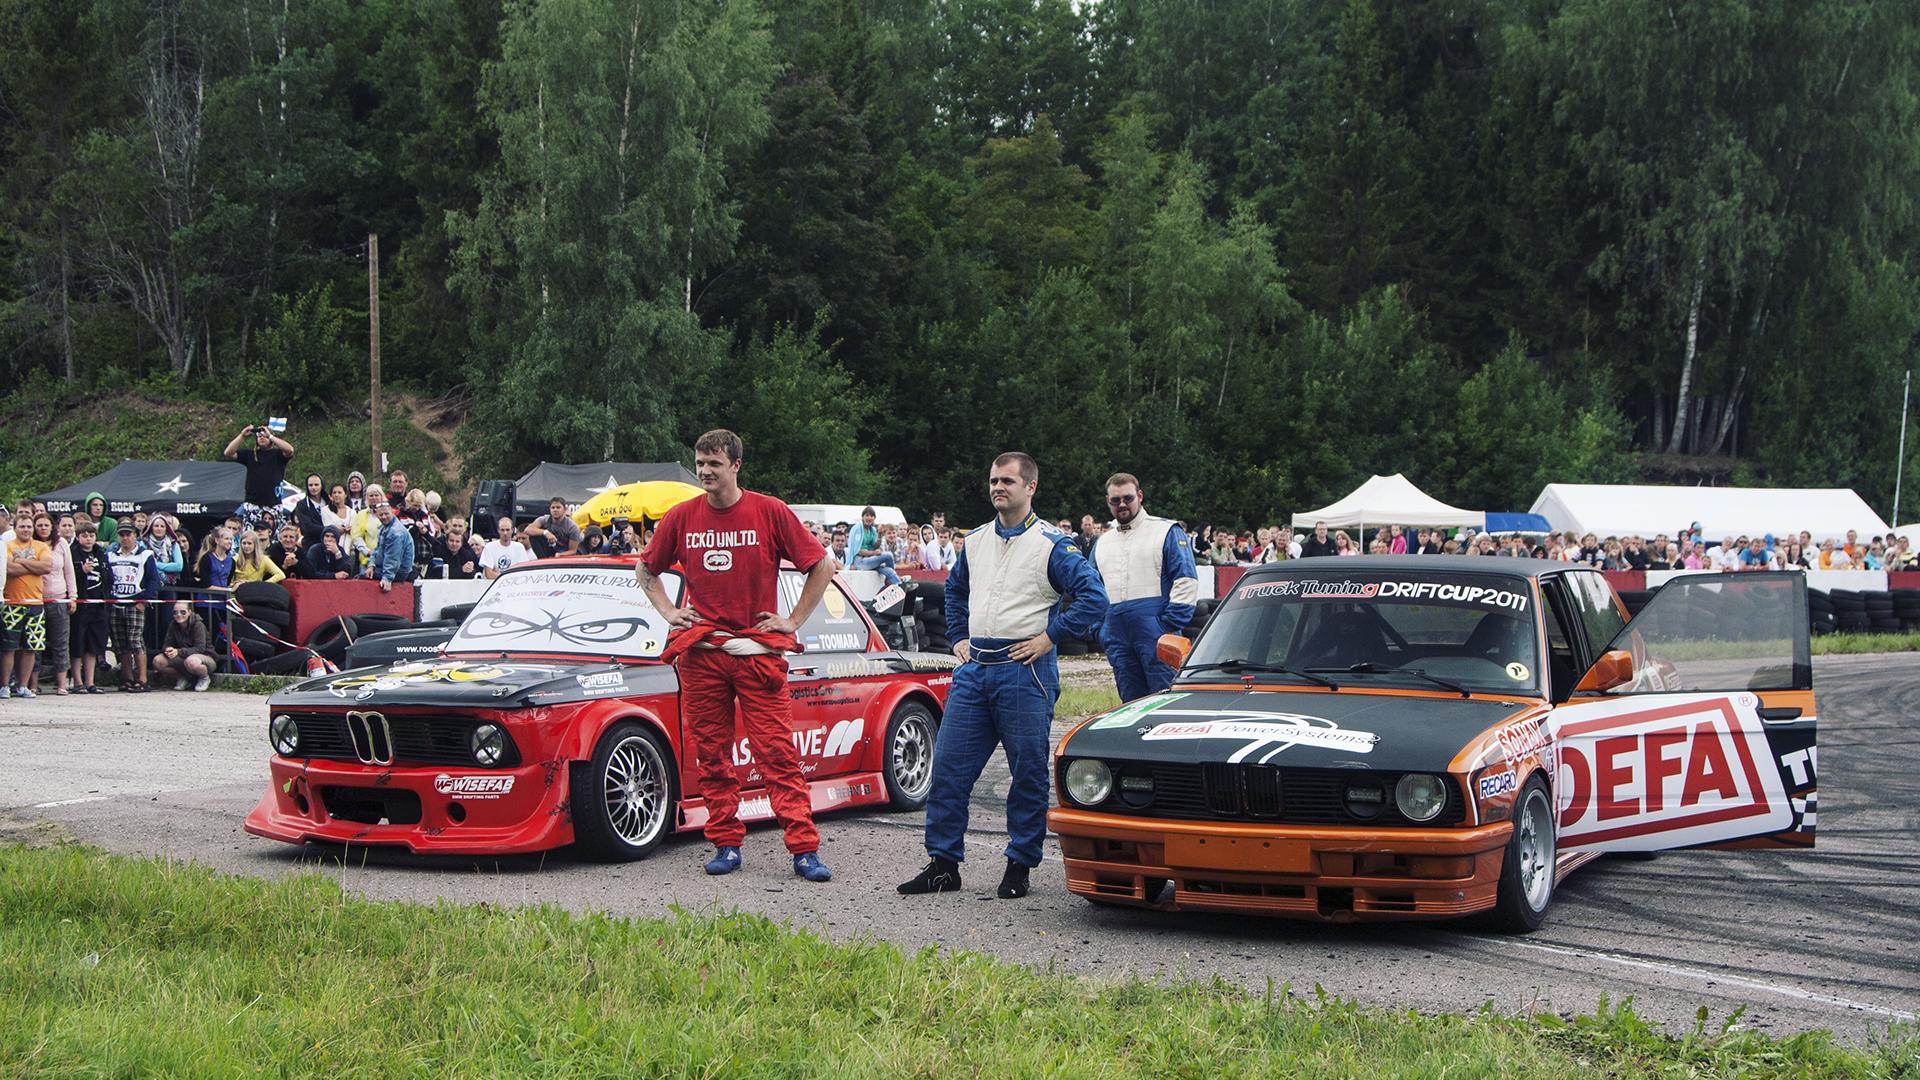 10-years-of-drifting-in-estonia-2011-by-wheelsbywovka-7